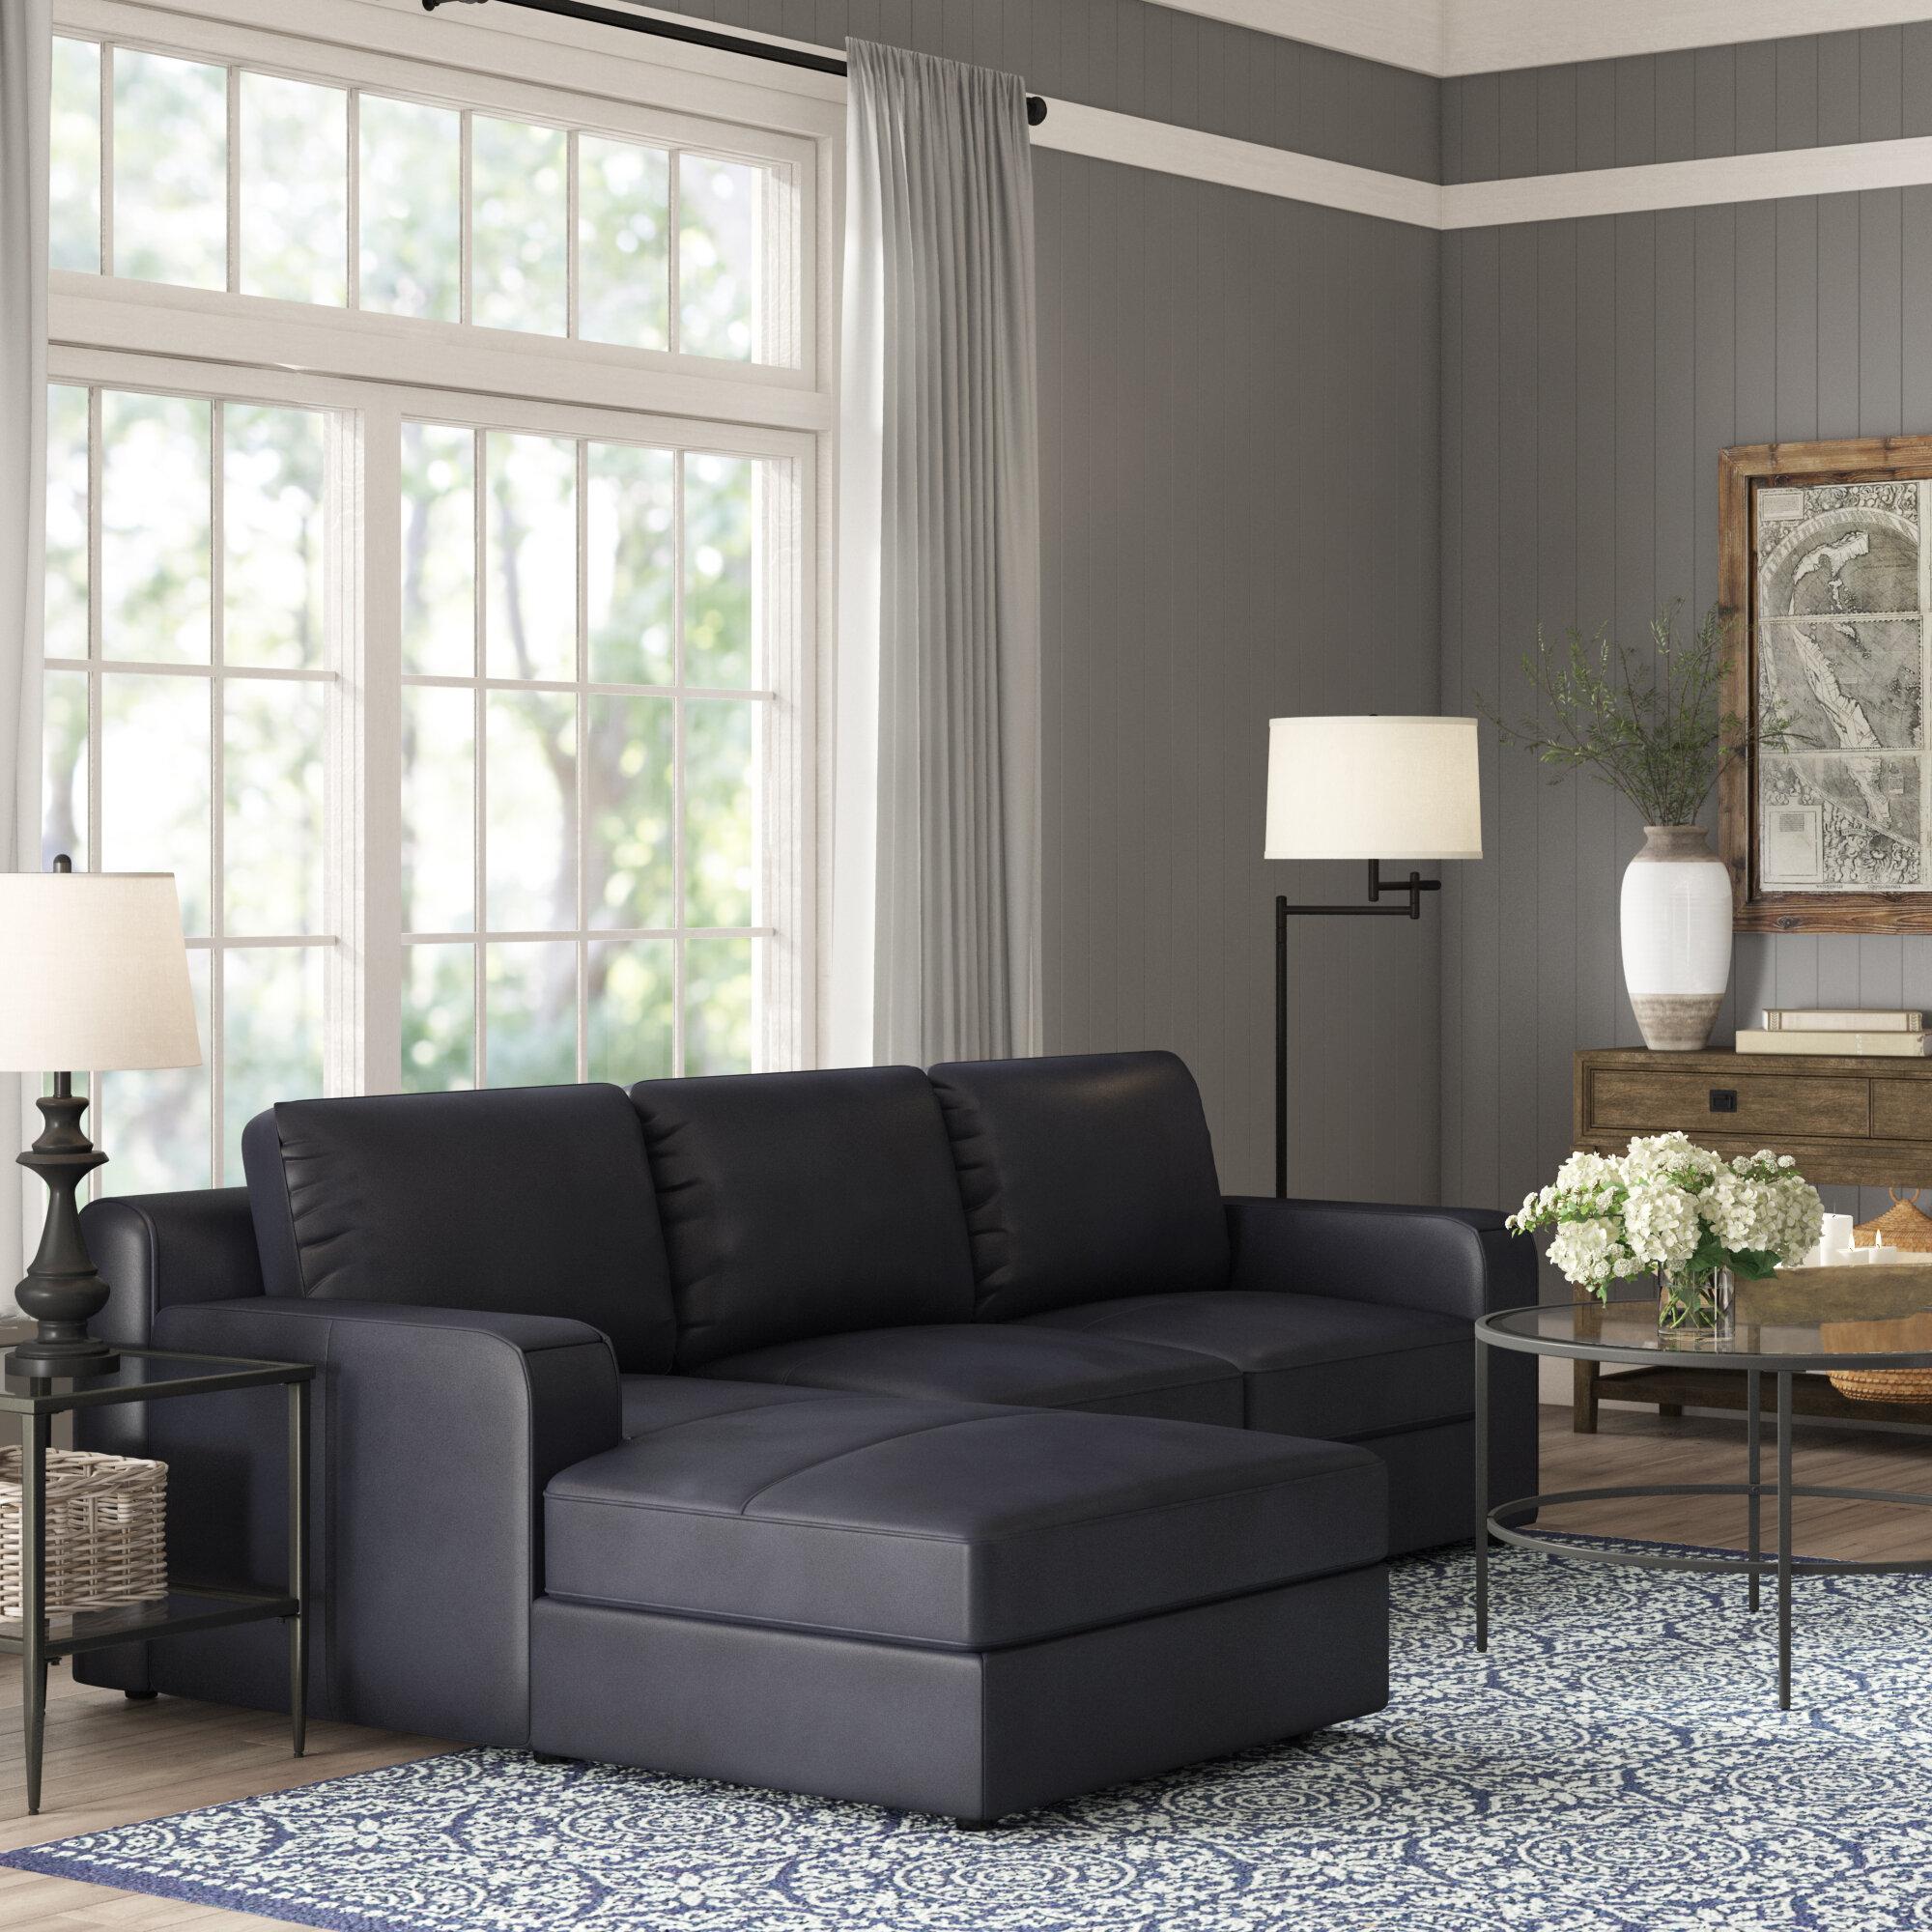 Becker Leather Sleeper Sectional